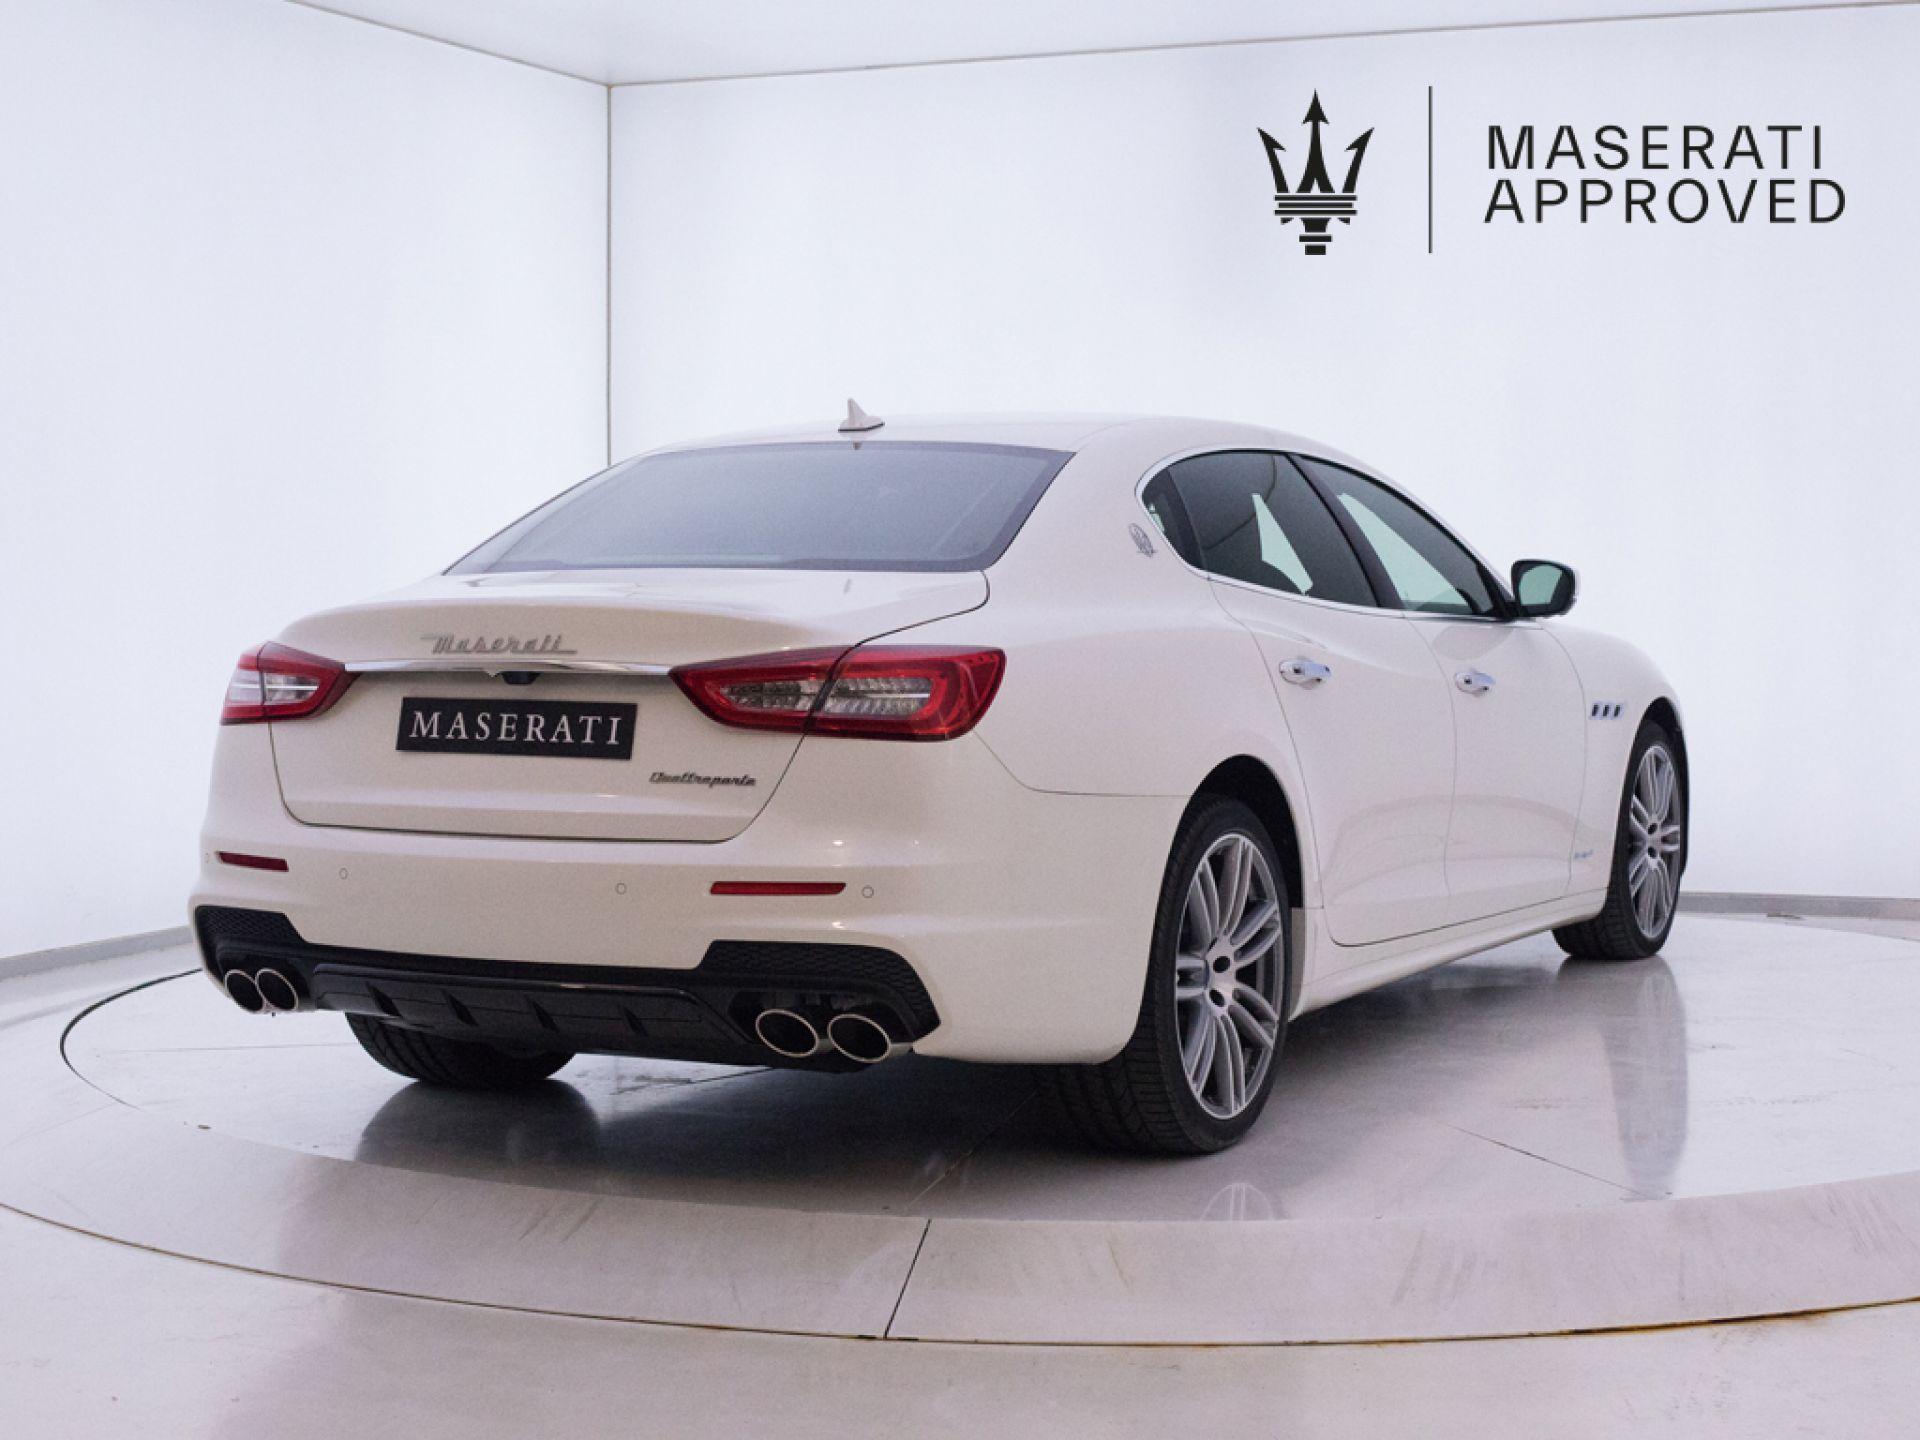 Maserati Quattroporte 3.0 V6 Diésel GranSport Automático